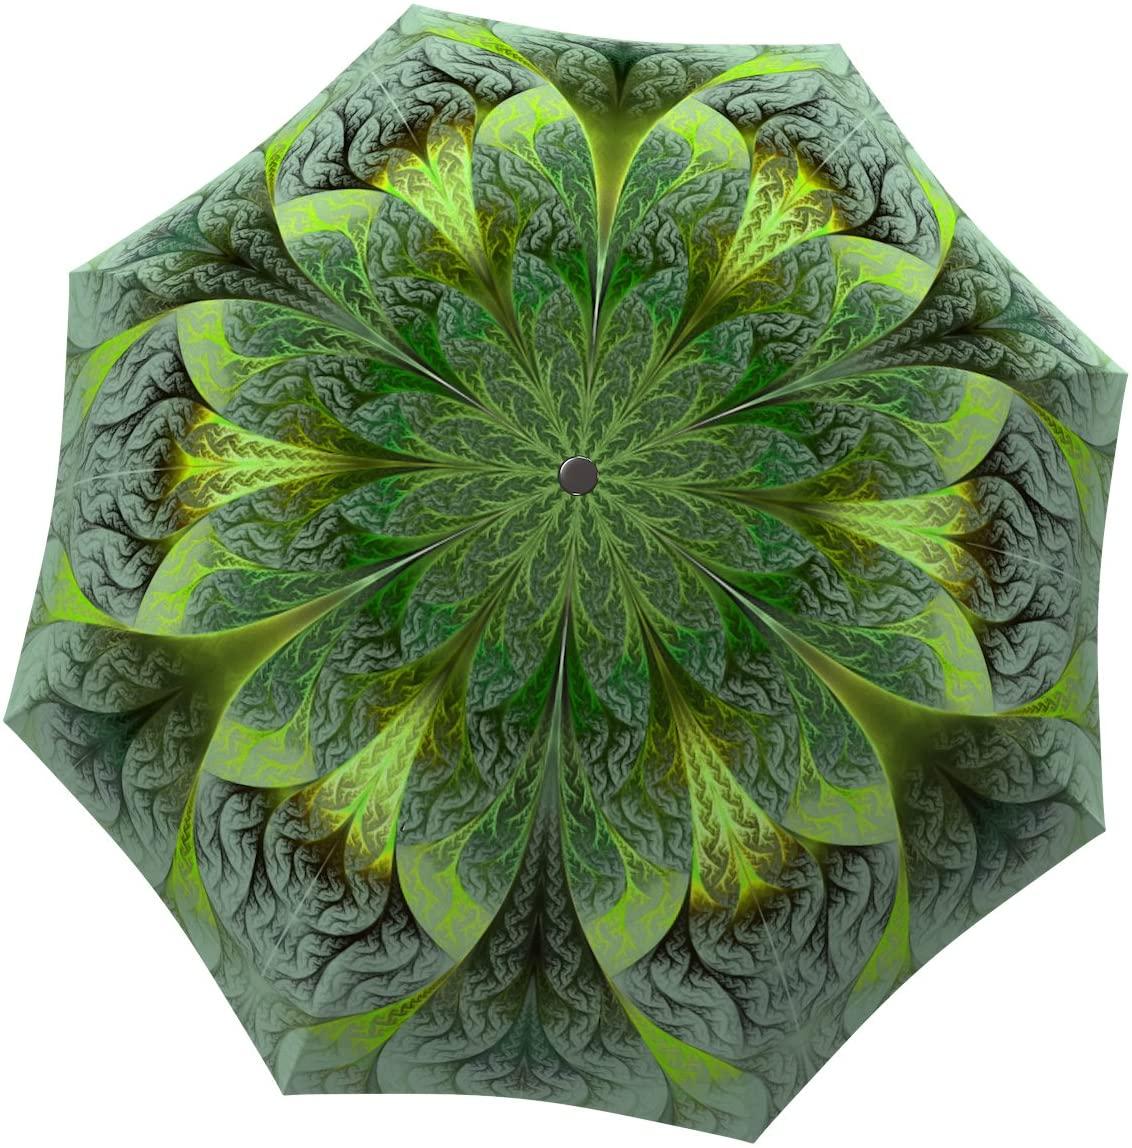 Floral Umbrella Windproof Compact for Travel - Brand Umbrella for Women - Lightweight Portable Rain Umbrella - Unique Gift Umbrella Green Flower Design - Folding Colorful Umbrella with Sleeve by LB